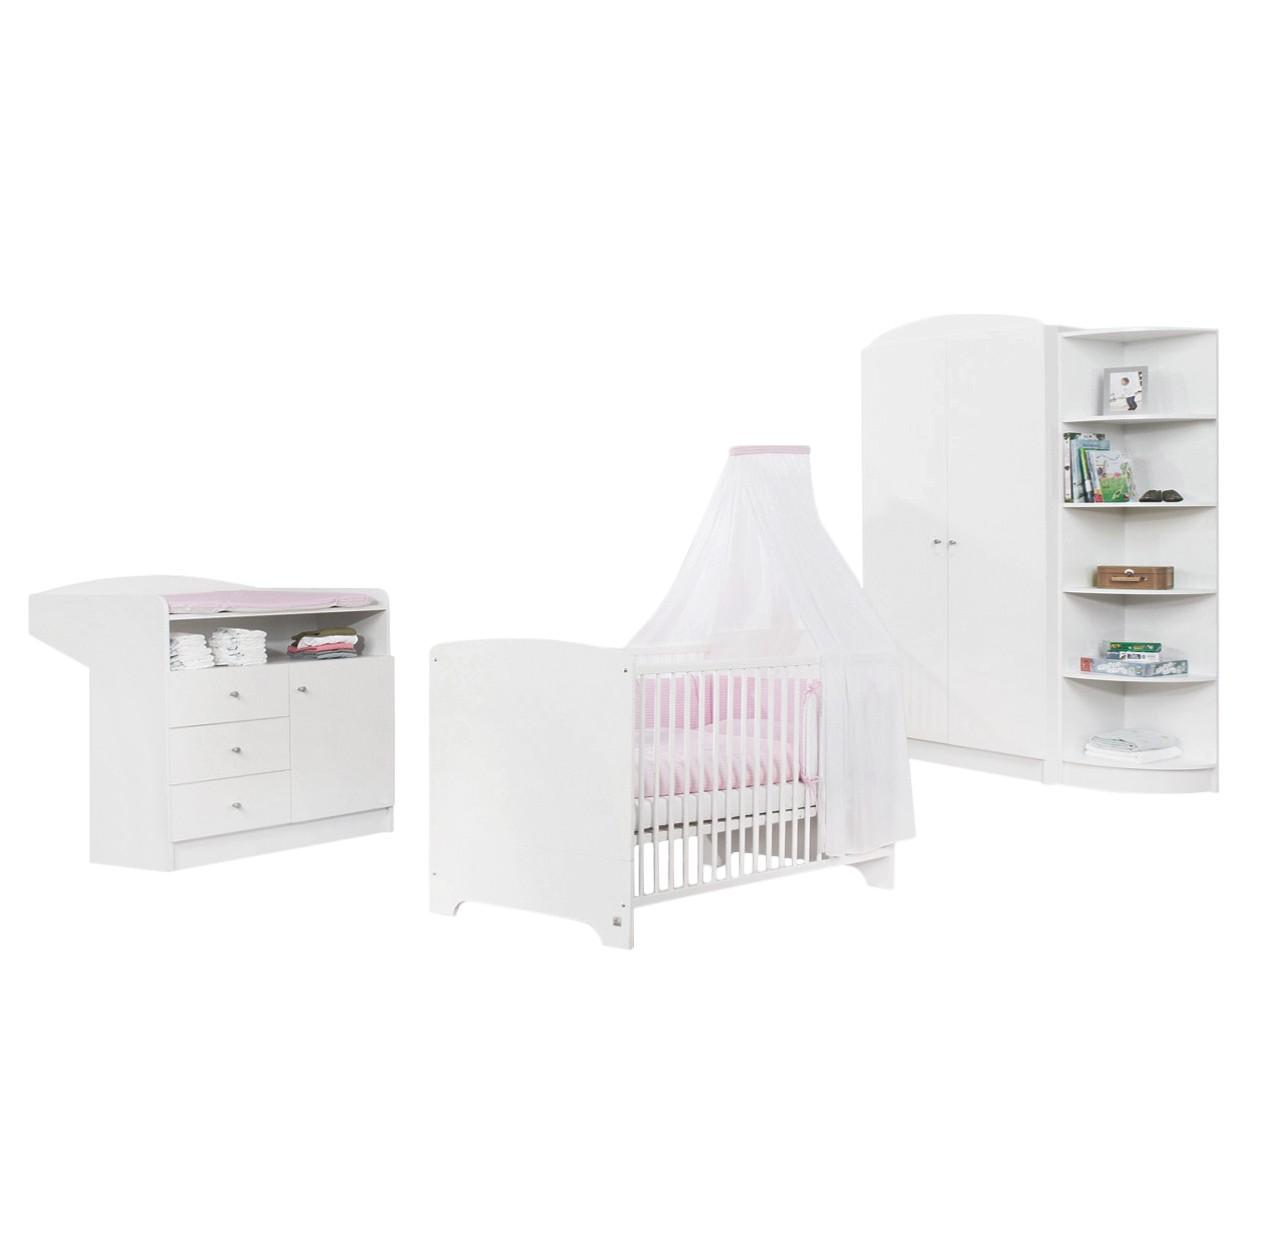 Sparset Jil (3-teilig) - Kiefer teilmassiv - Babybett, Wickelkommode & Kleiderschrank 2-türig - Weiß lackiert, Pinolino